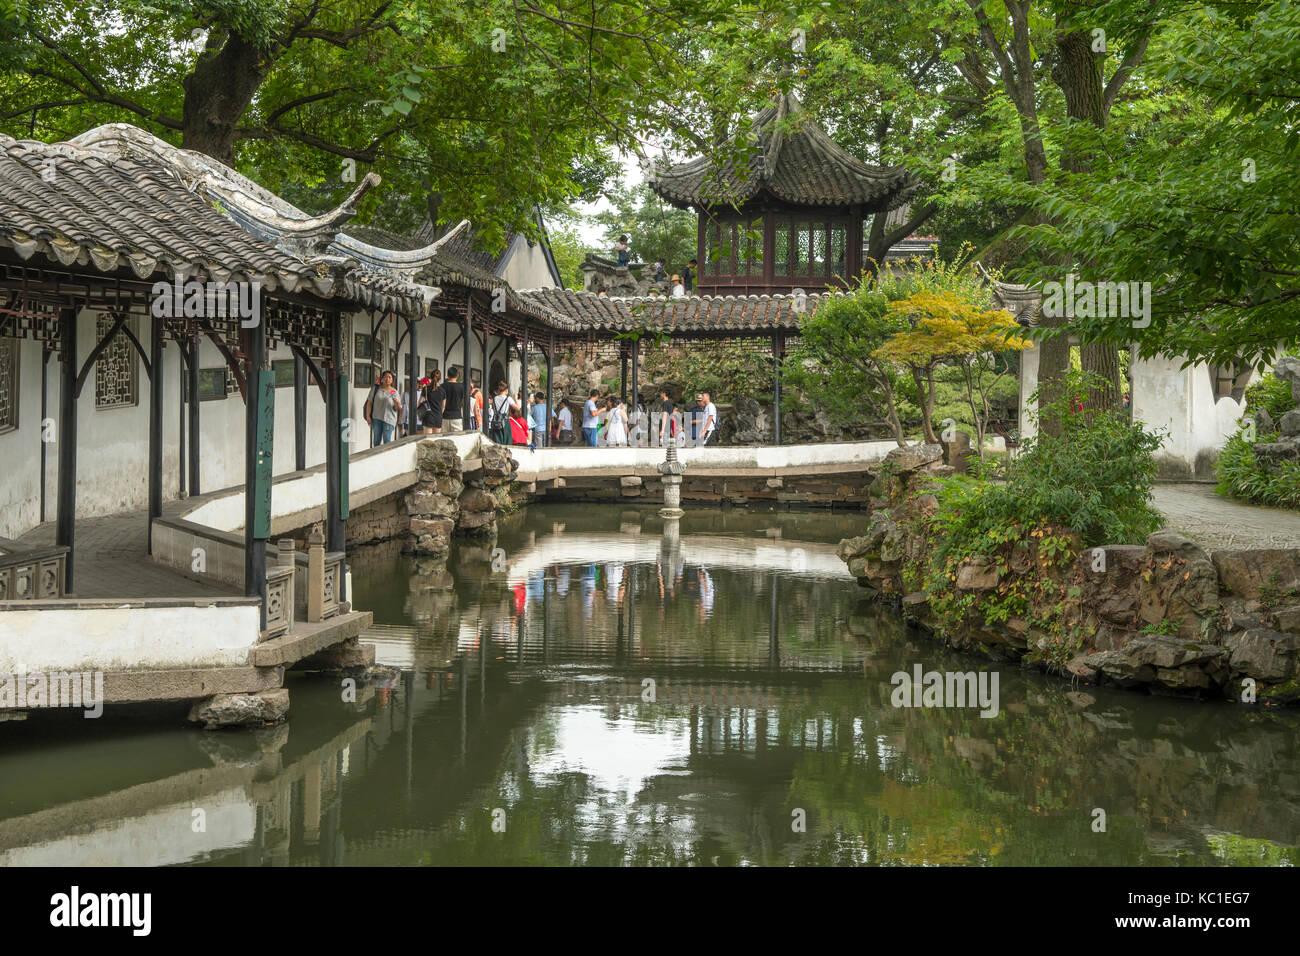 The Long Corridor, Humble Administrator's Garden, Suzhou, China - Stock Image